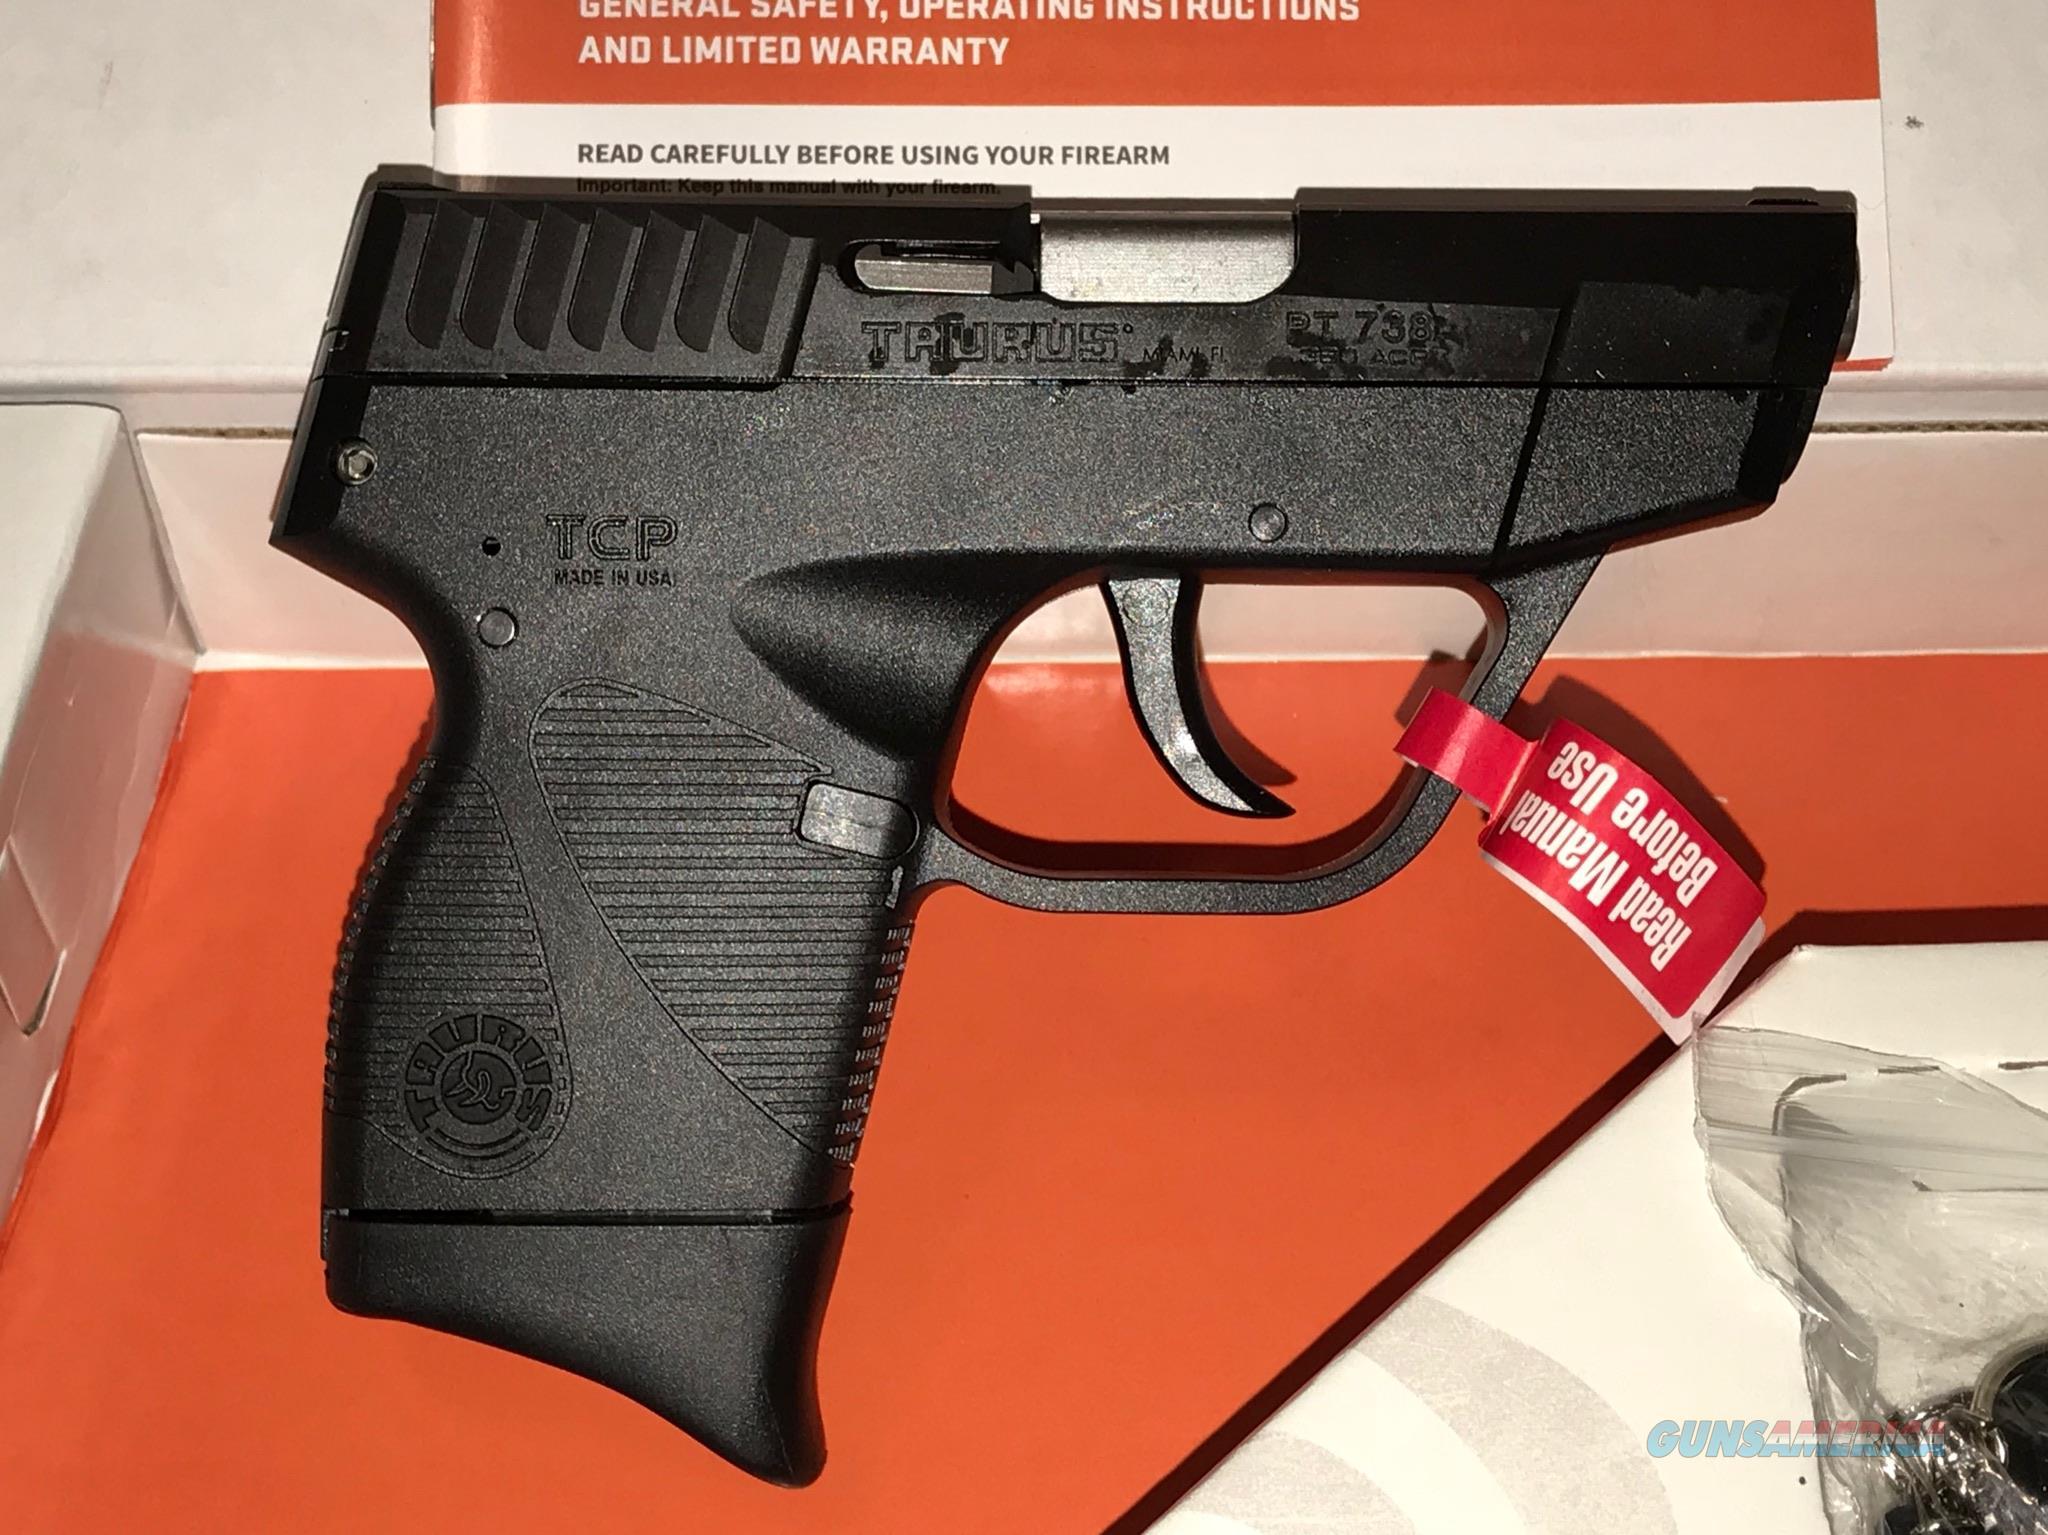 TAURUS 738TCP .380ACP 6+1-SHOT   Guns > Pistols > Taurus Pistols > Semi Auto Pistols > Polymer Frame